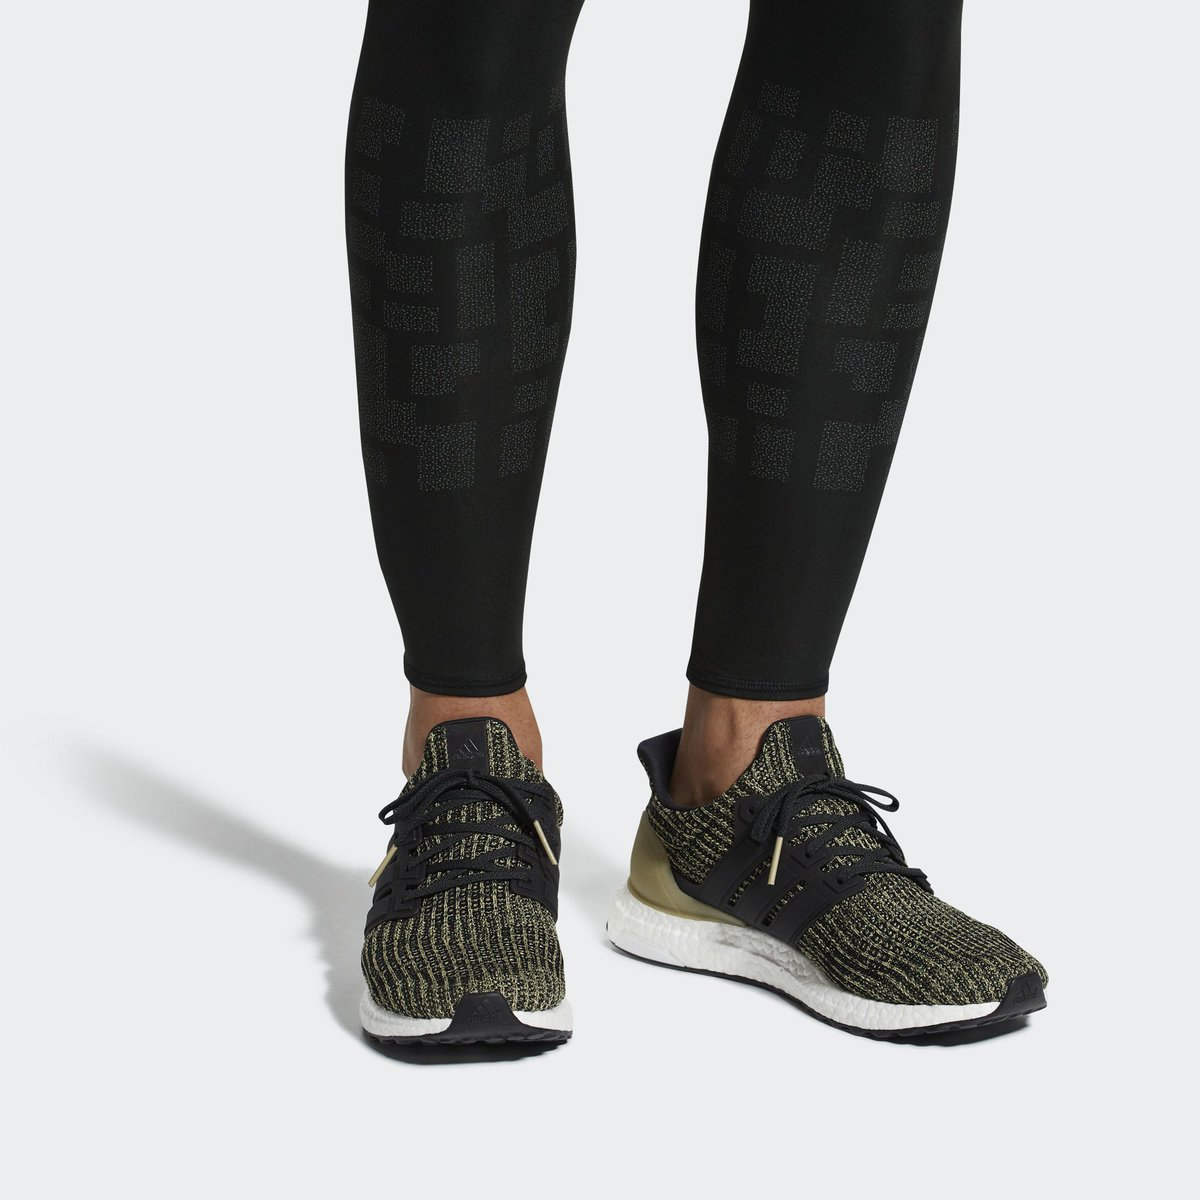 Adidas UltraBOOST 19 REVIEW (RUNNING PERFORMANCE